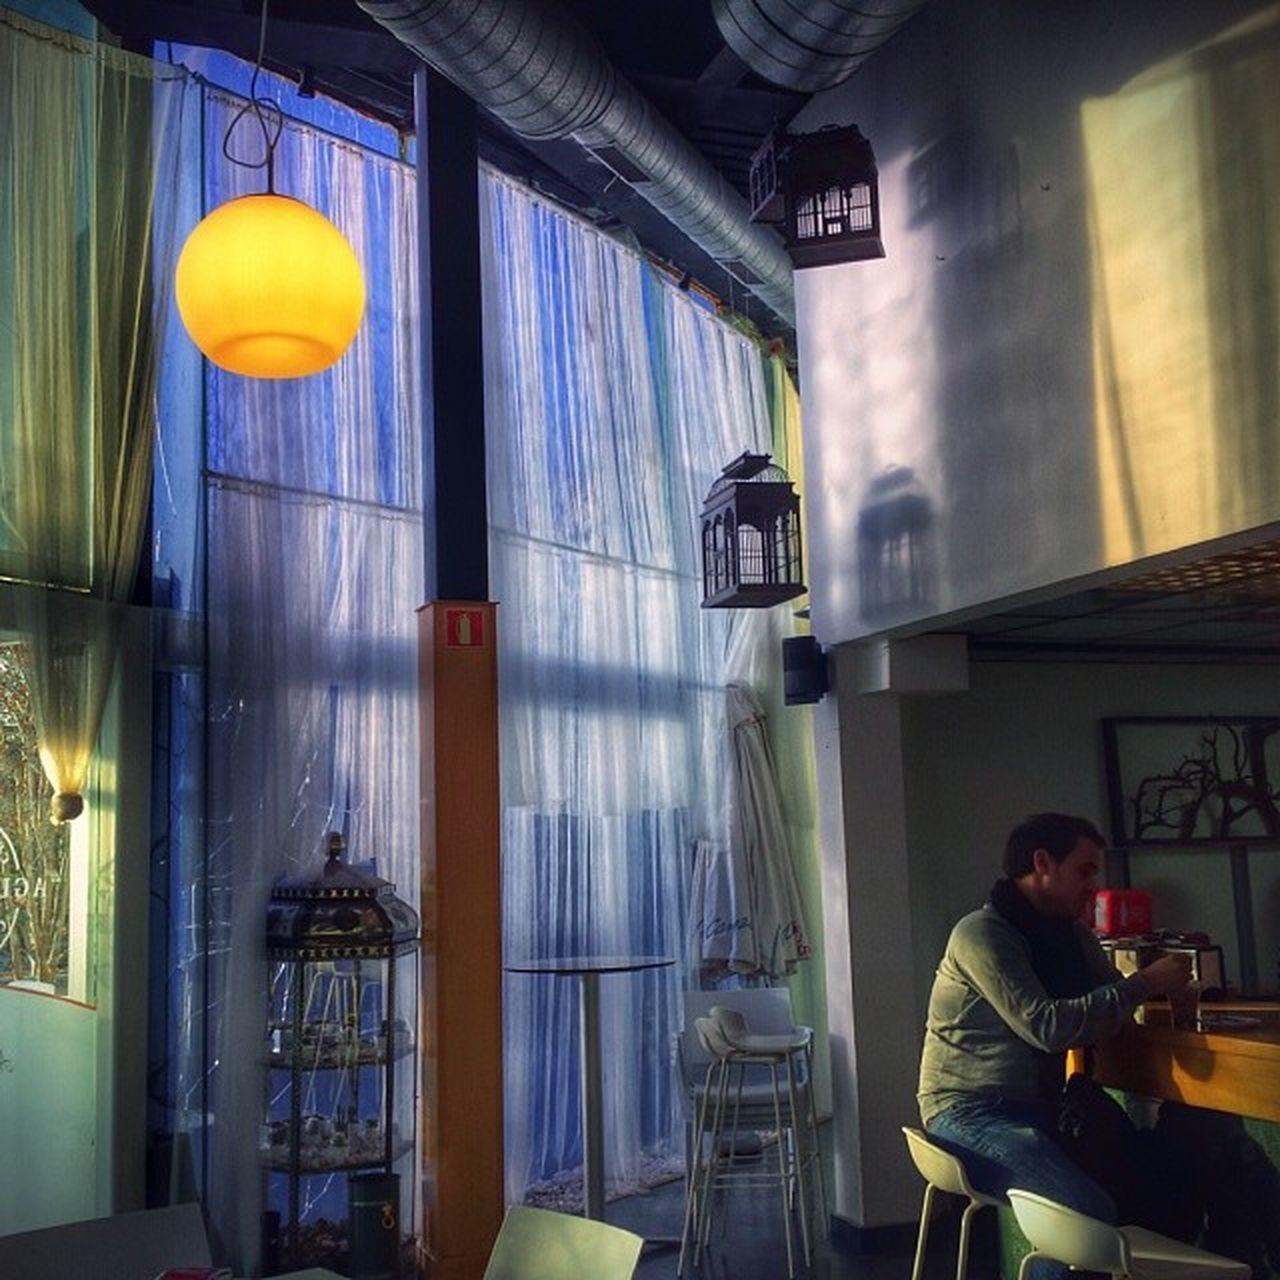 Café tras cortina de agua